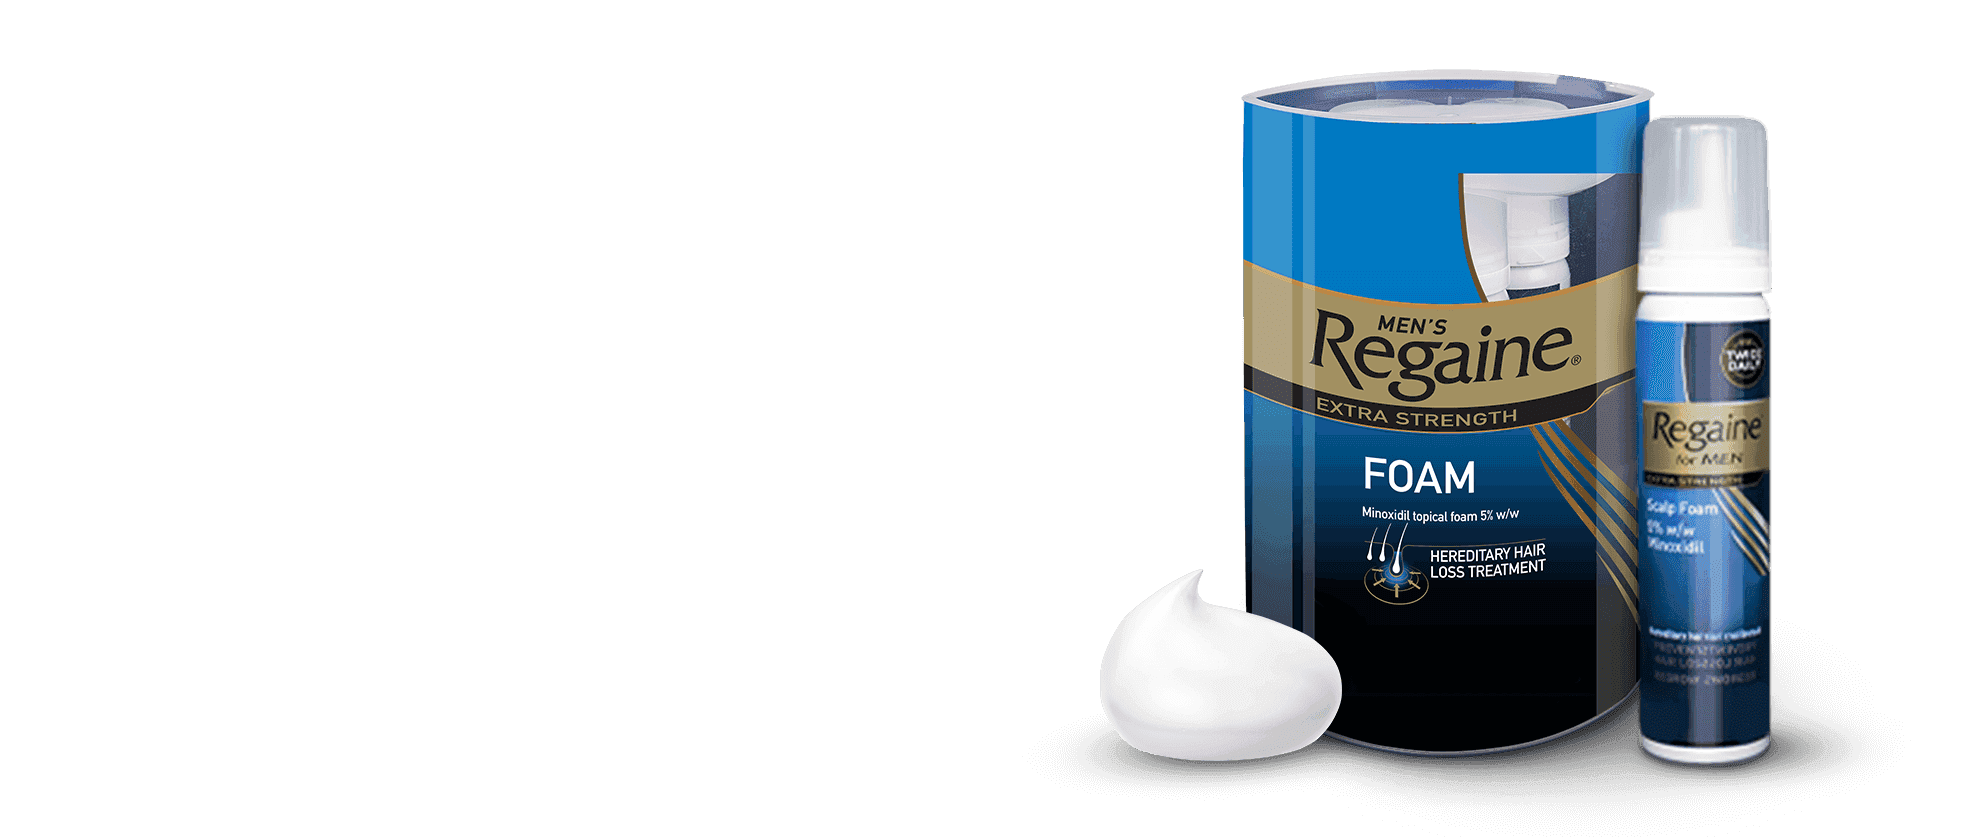 Try the new Regaine Foam